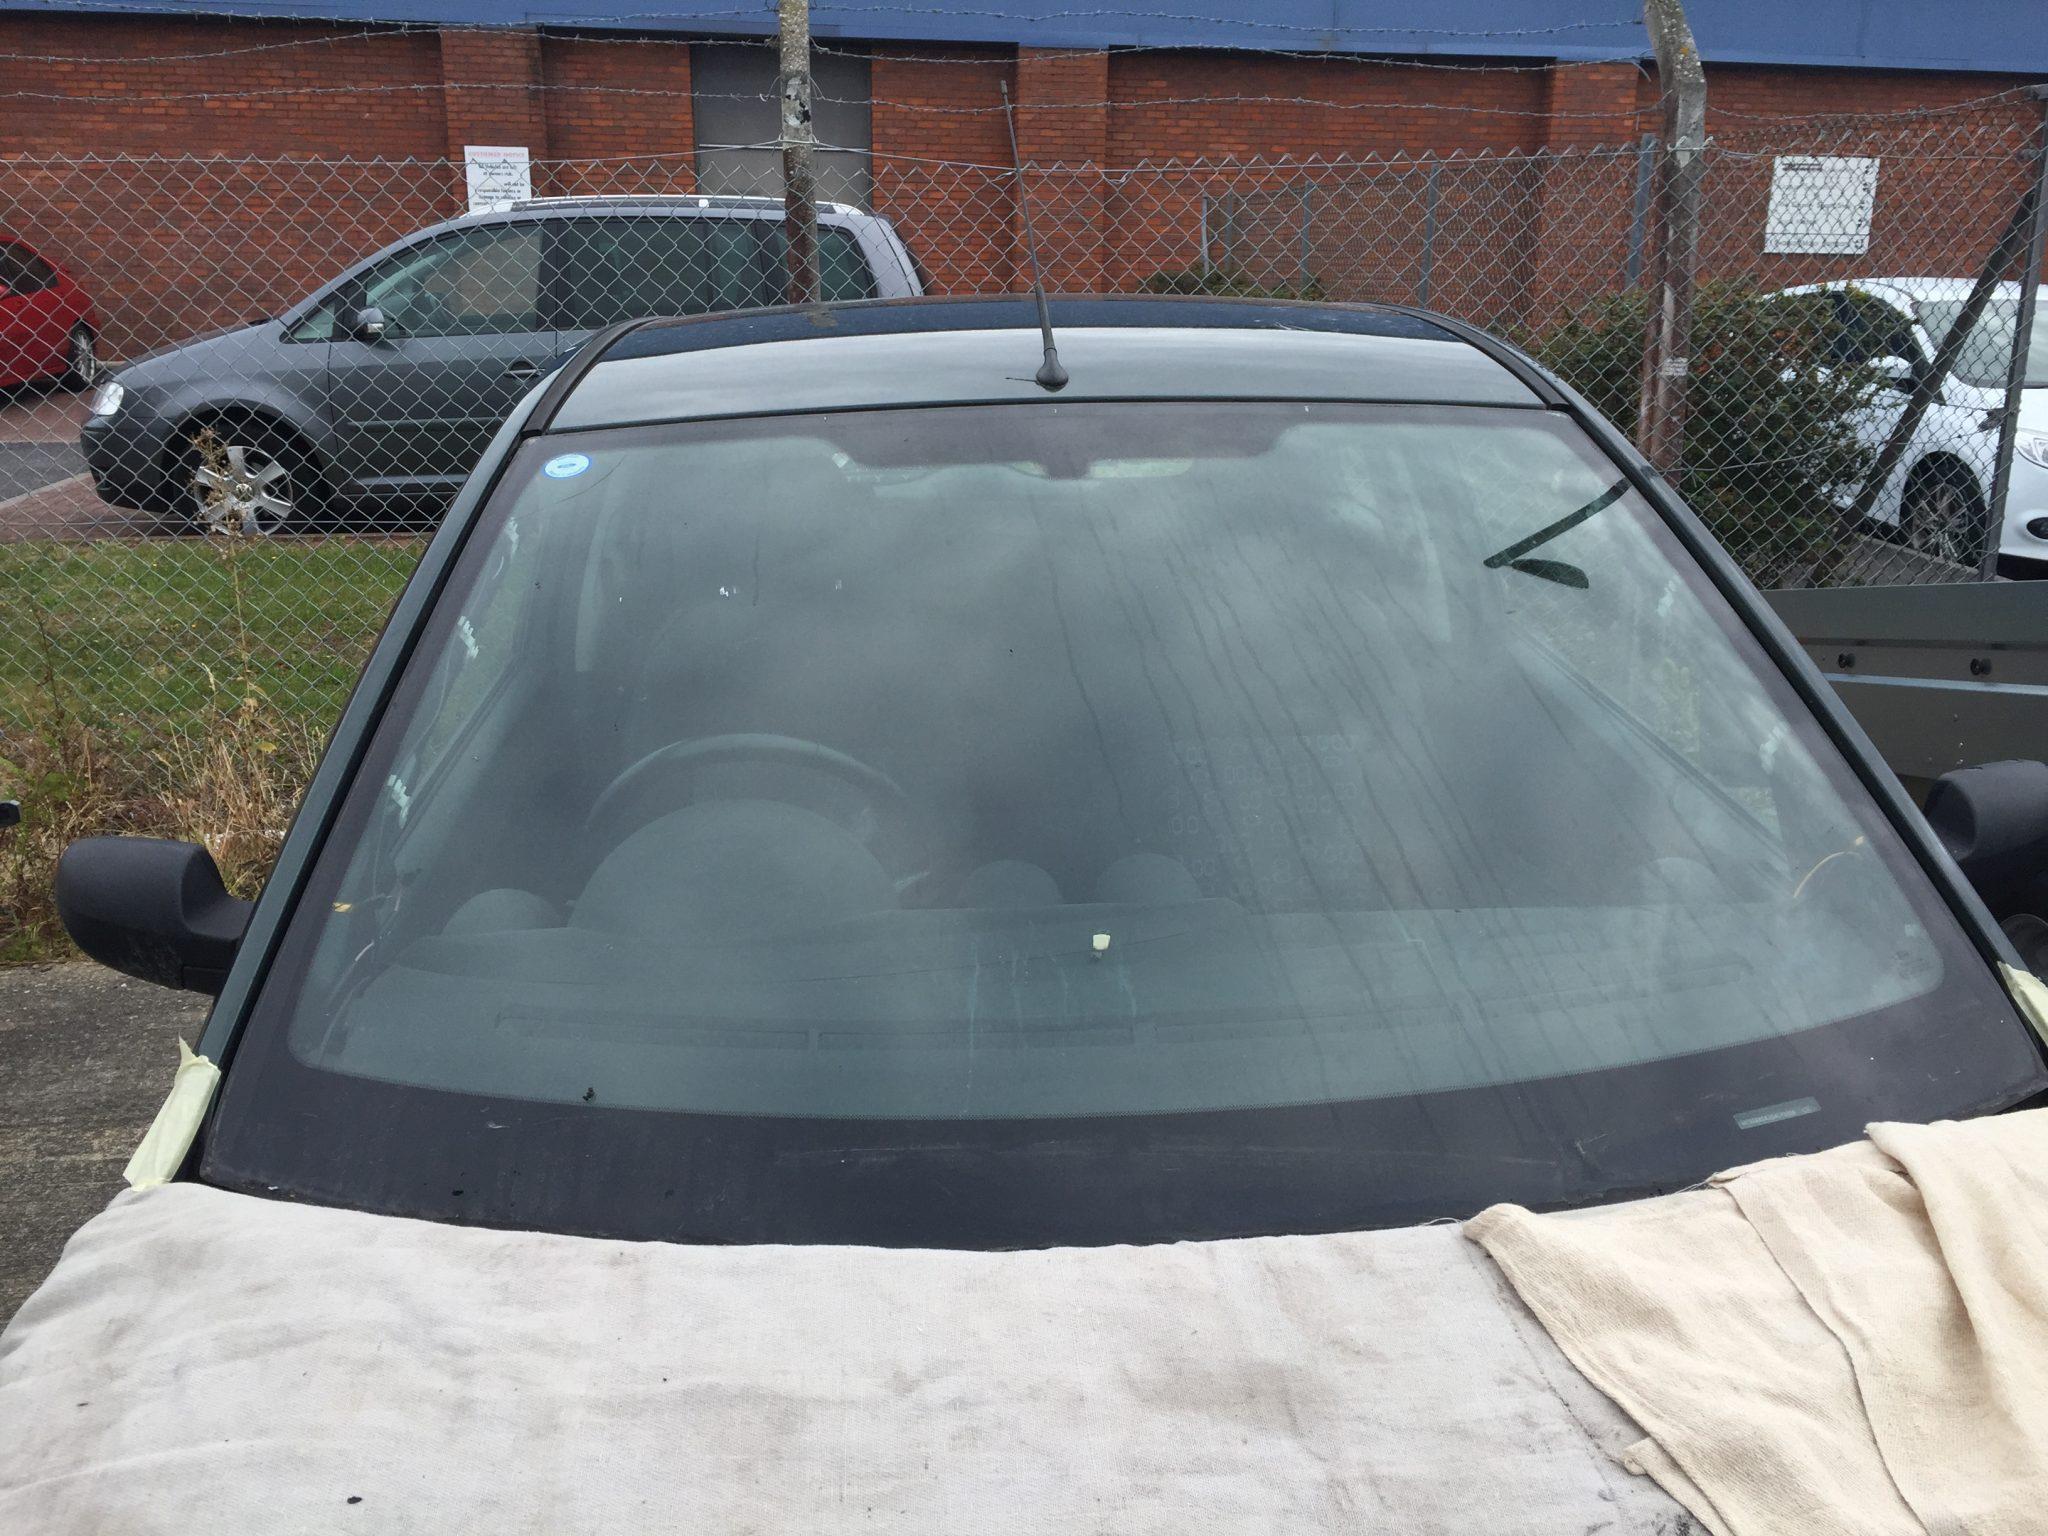 Fiesta Windscreen Replacement